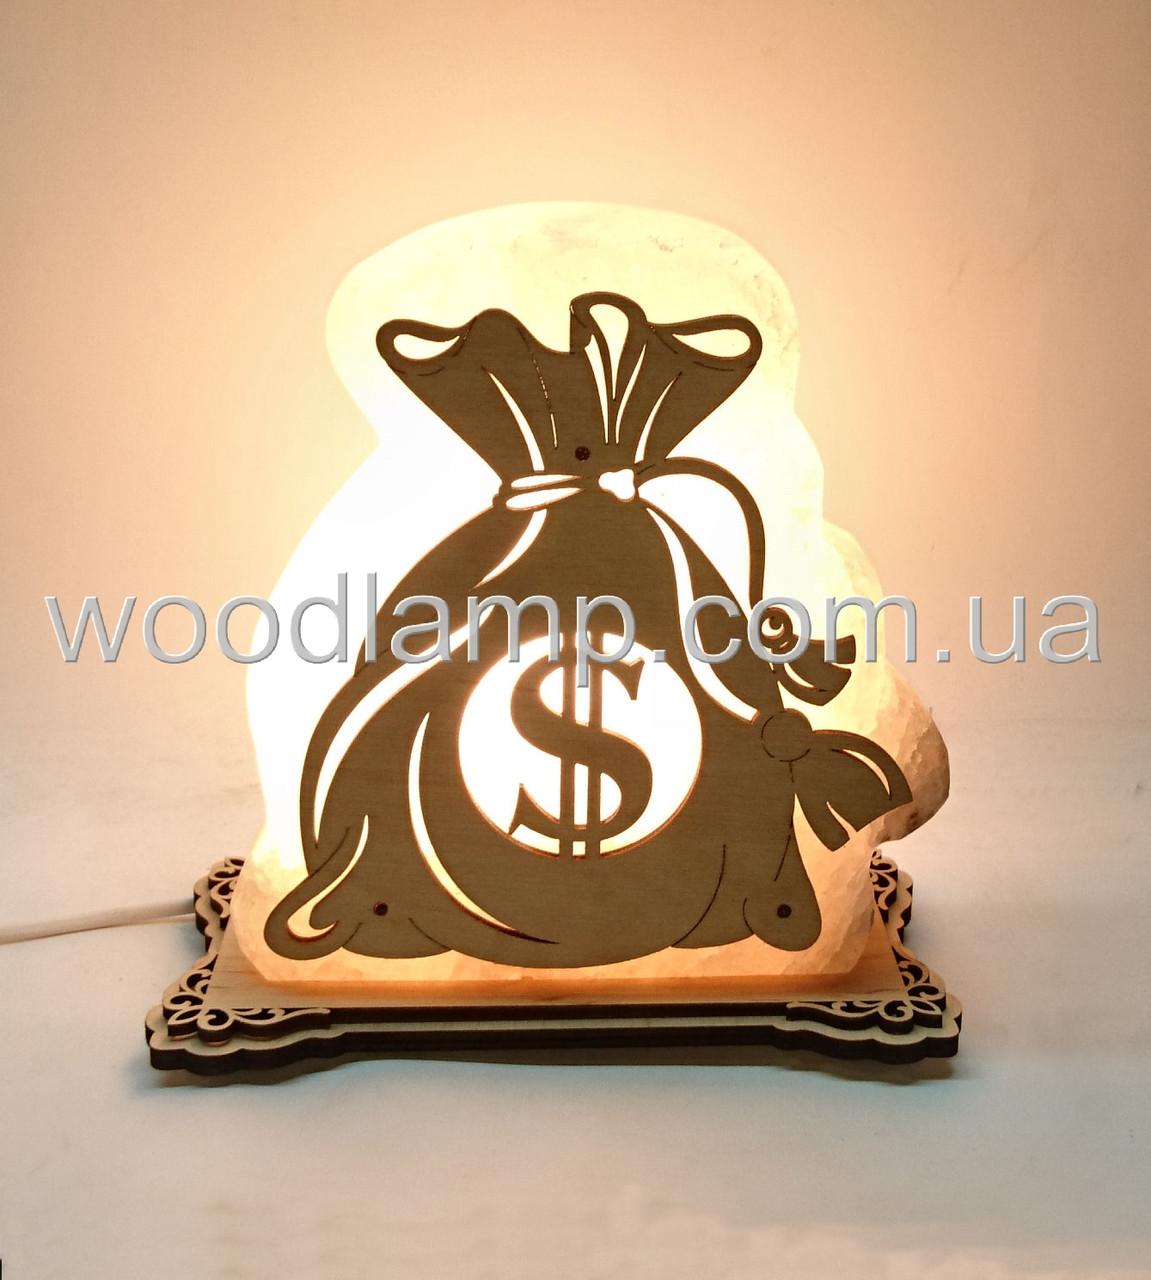 Соляной светильник Мешок денег Доллар